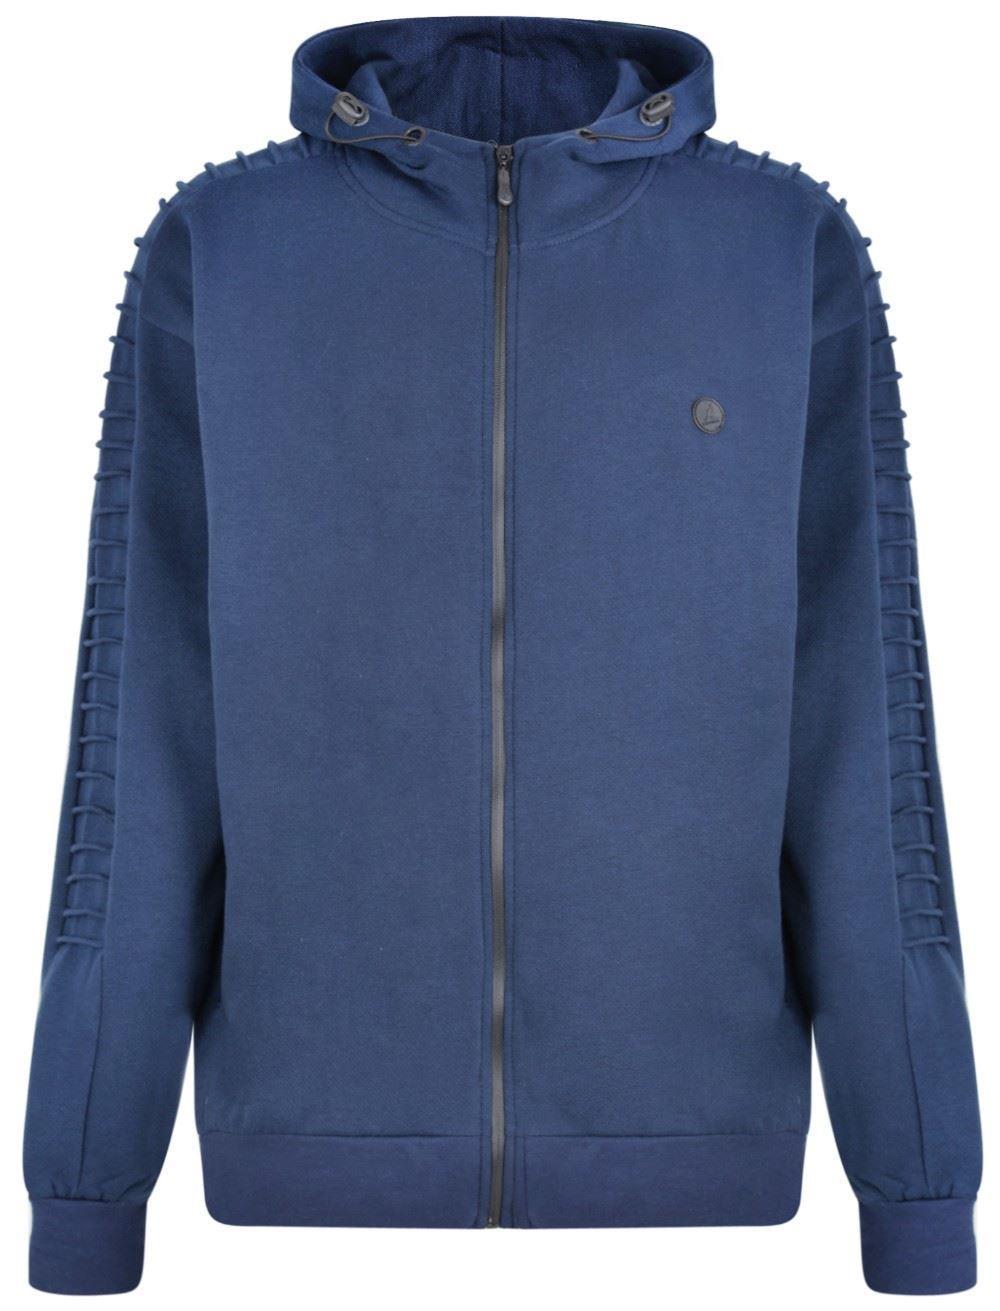 b78d21ea Kangol Branxton Zip-Through Hoody - Navy 6XL 7XL 8XL Big Clothing 4 U